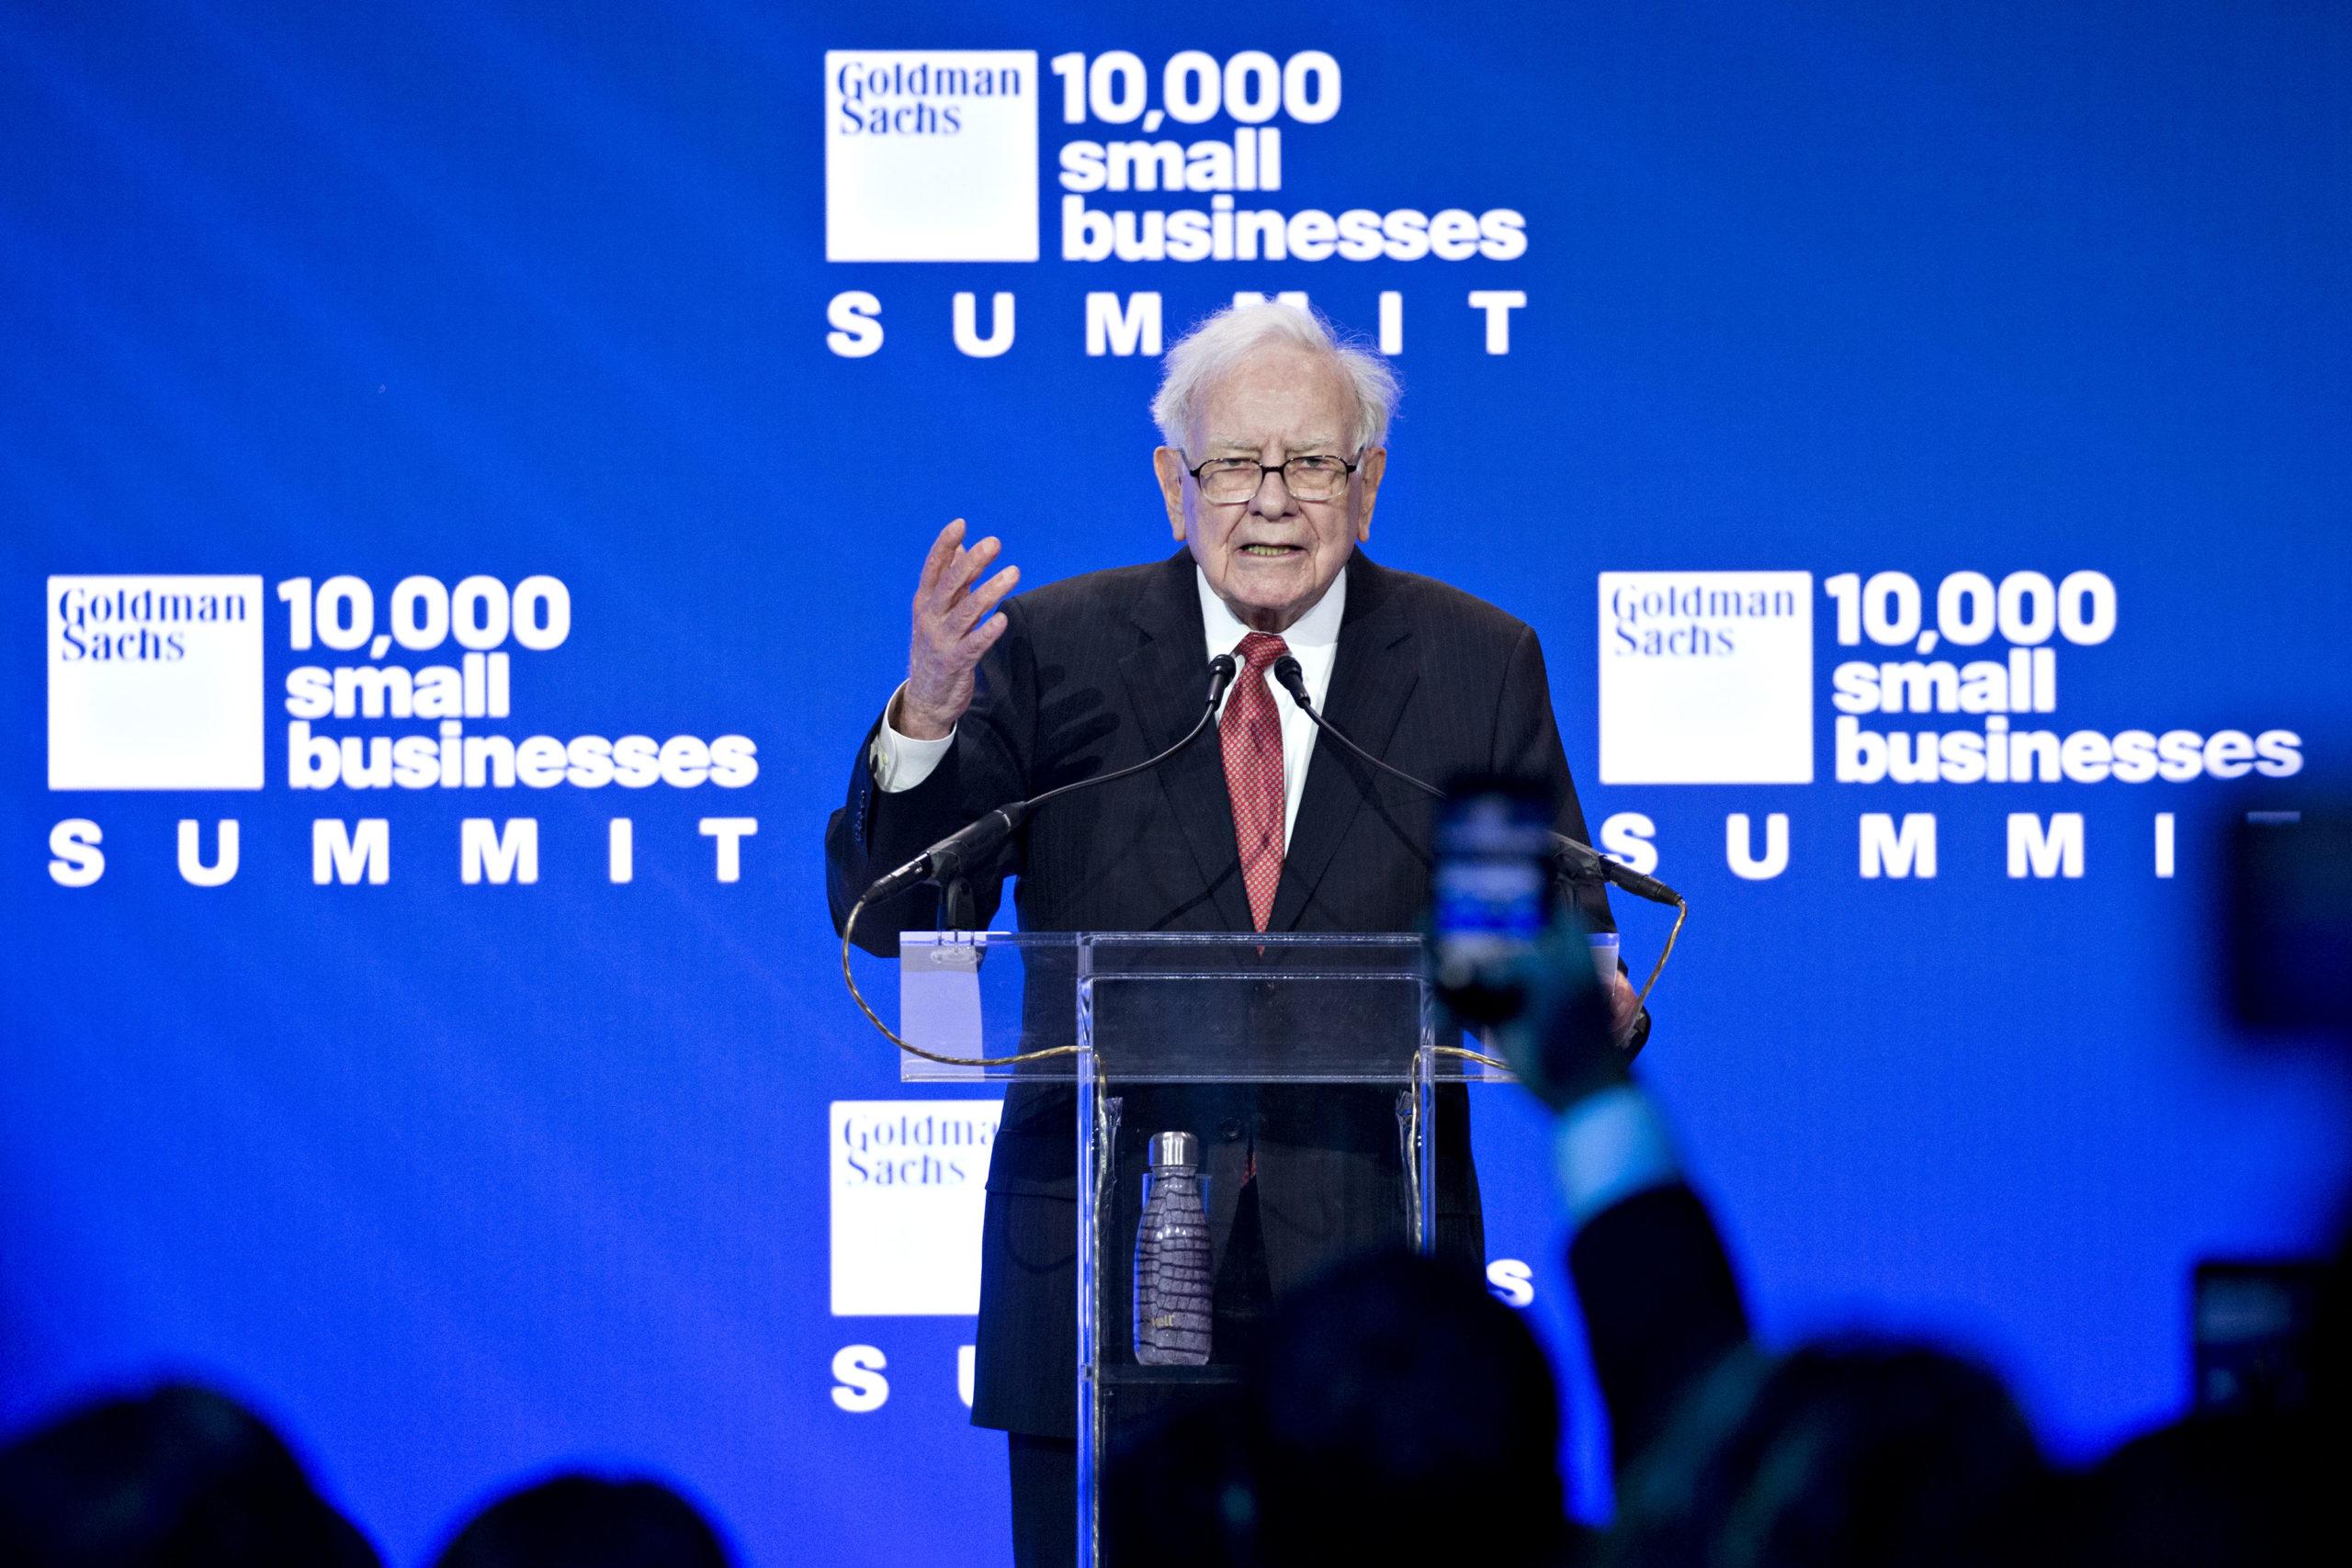 Value Investing And Warren Buffett